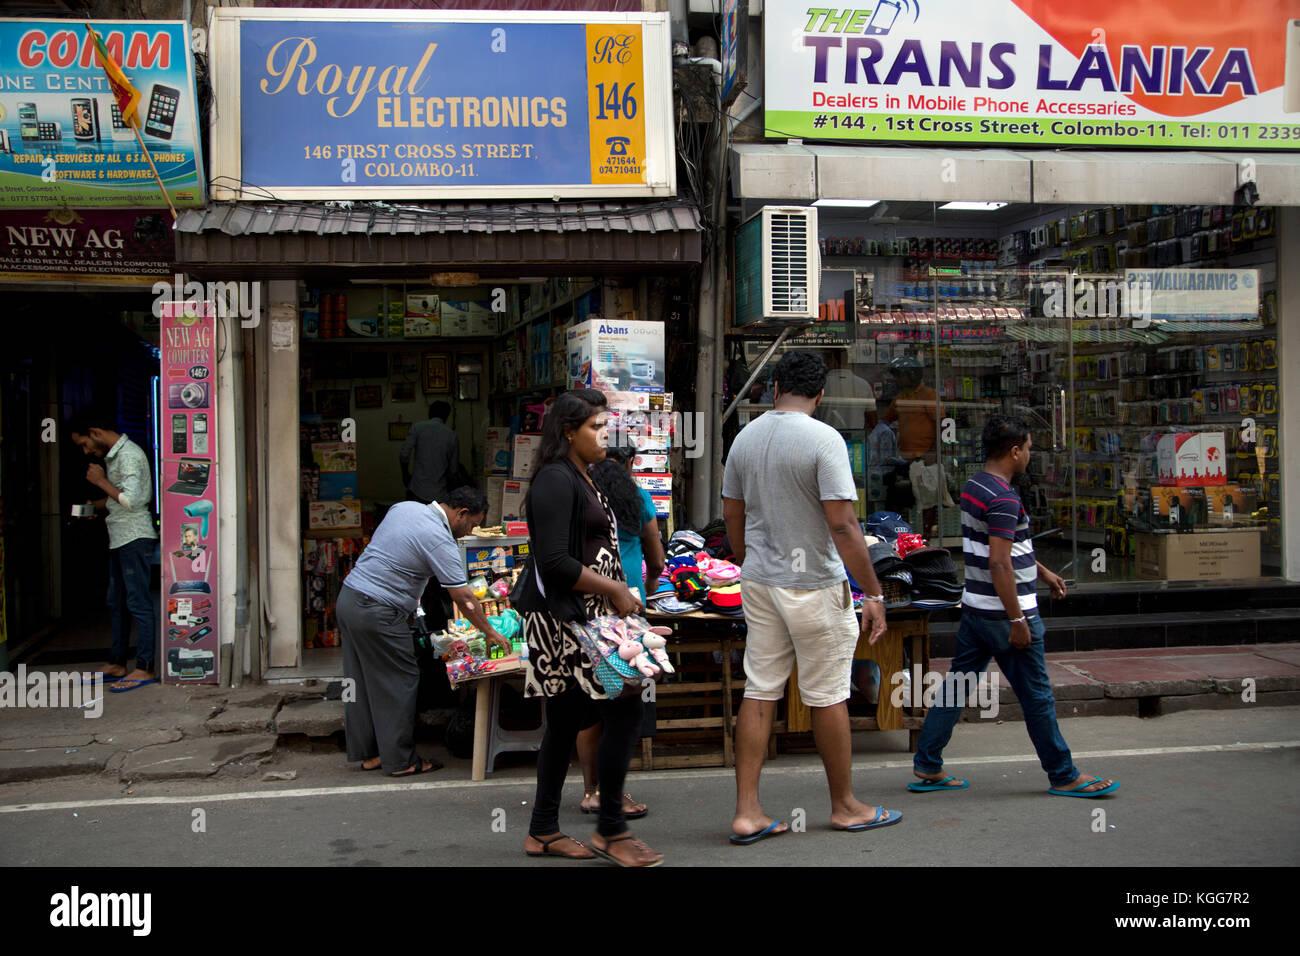 Online electronics shopping in sri lanka